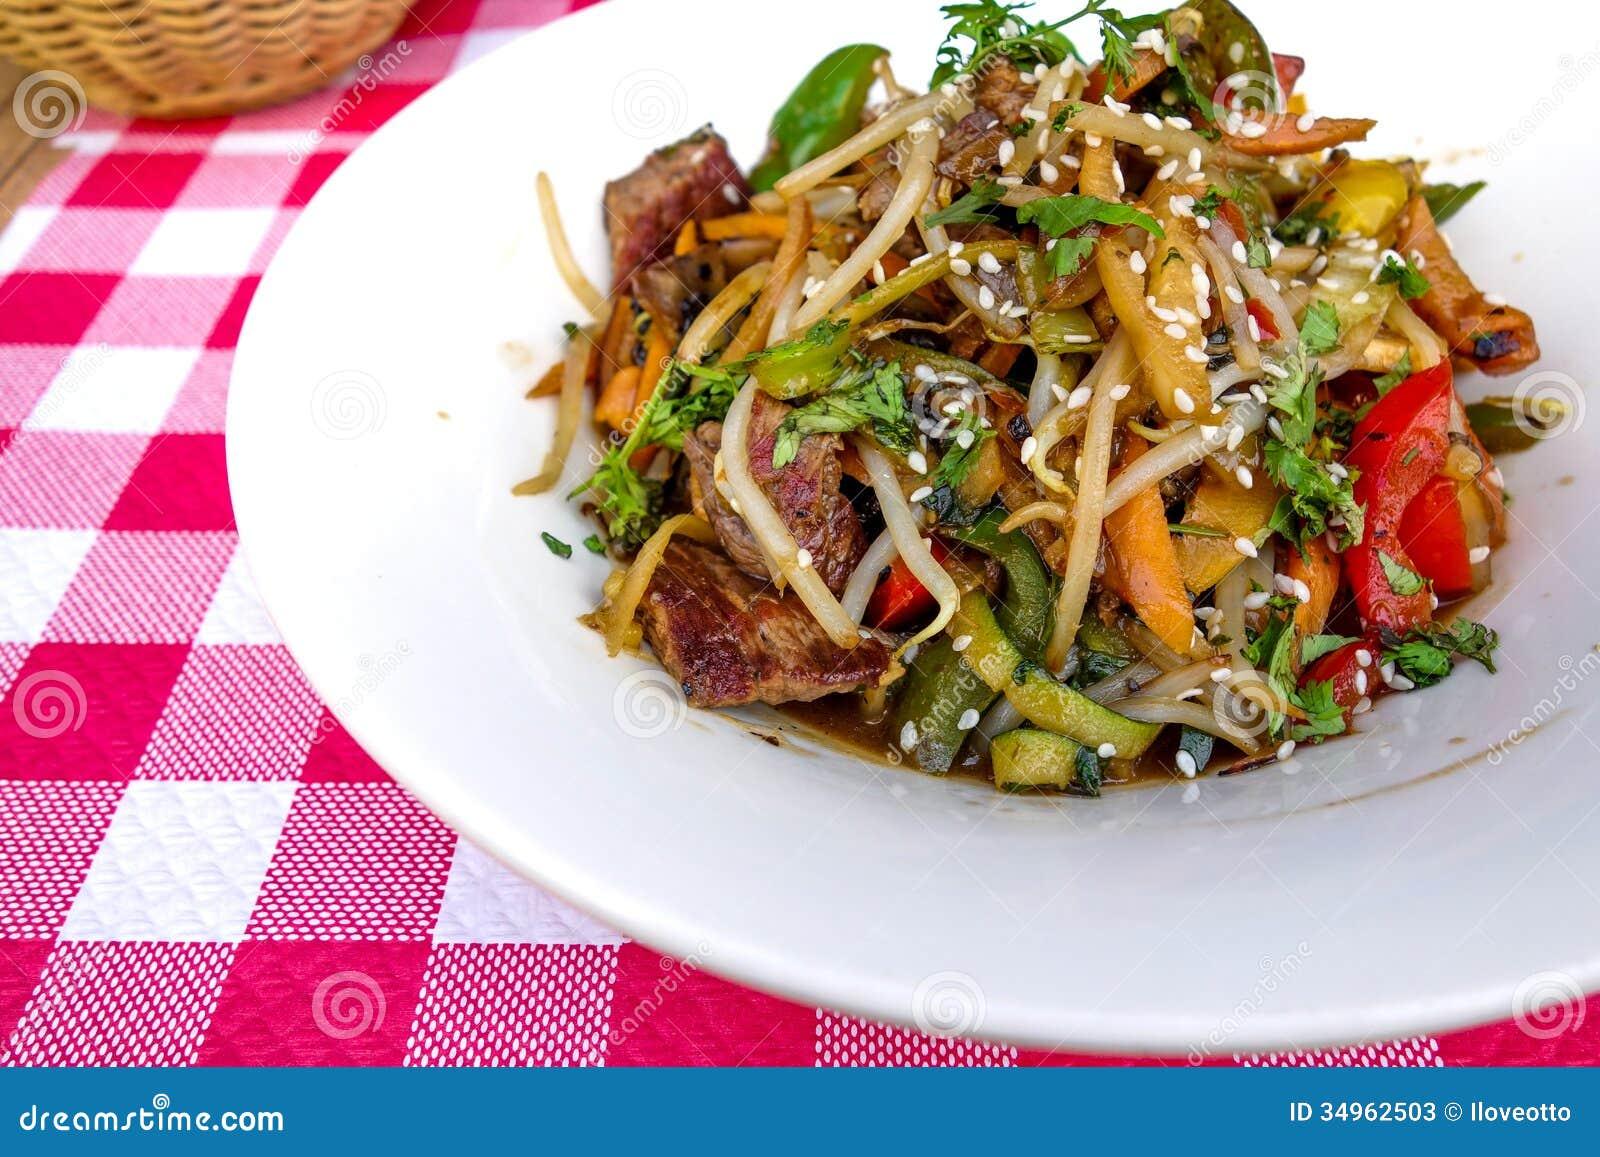 Fried noodle asian food